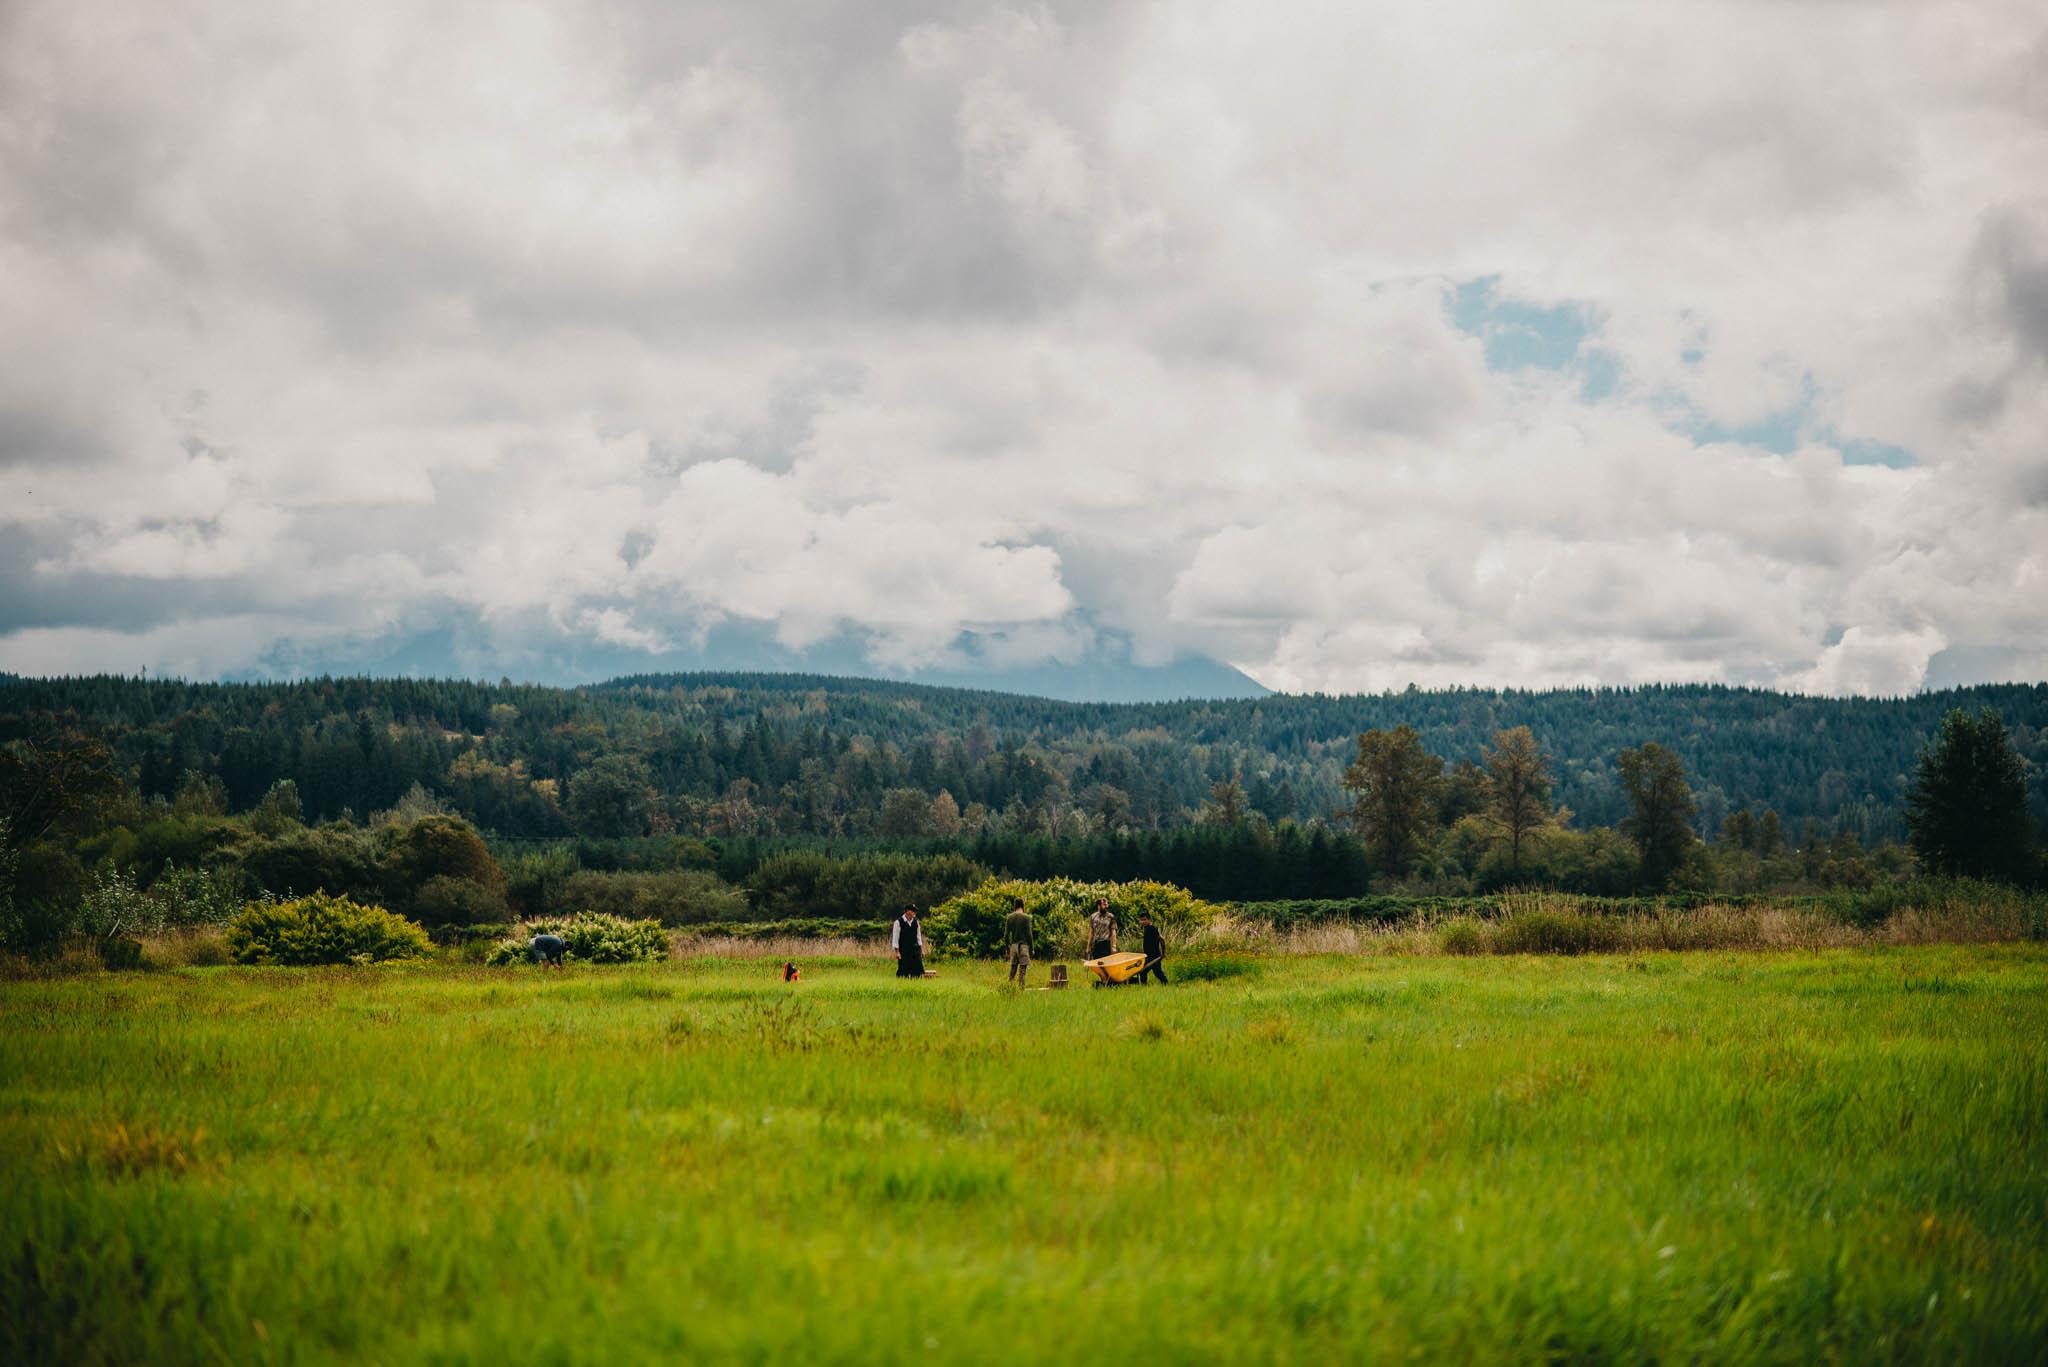 farm field in western washington